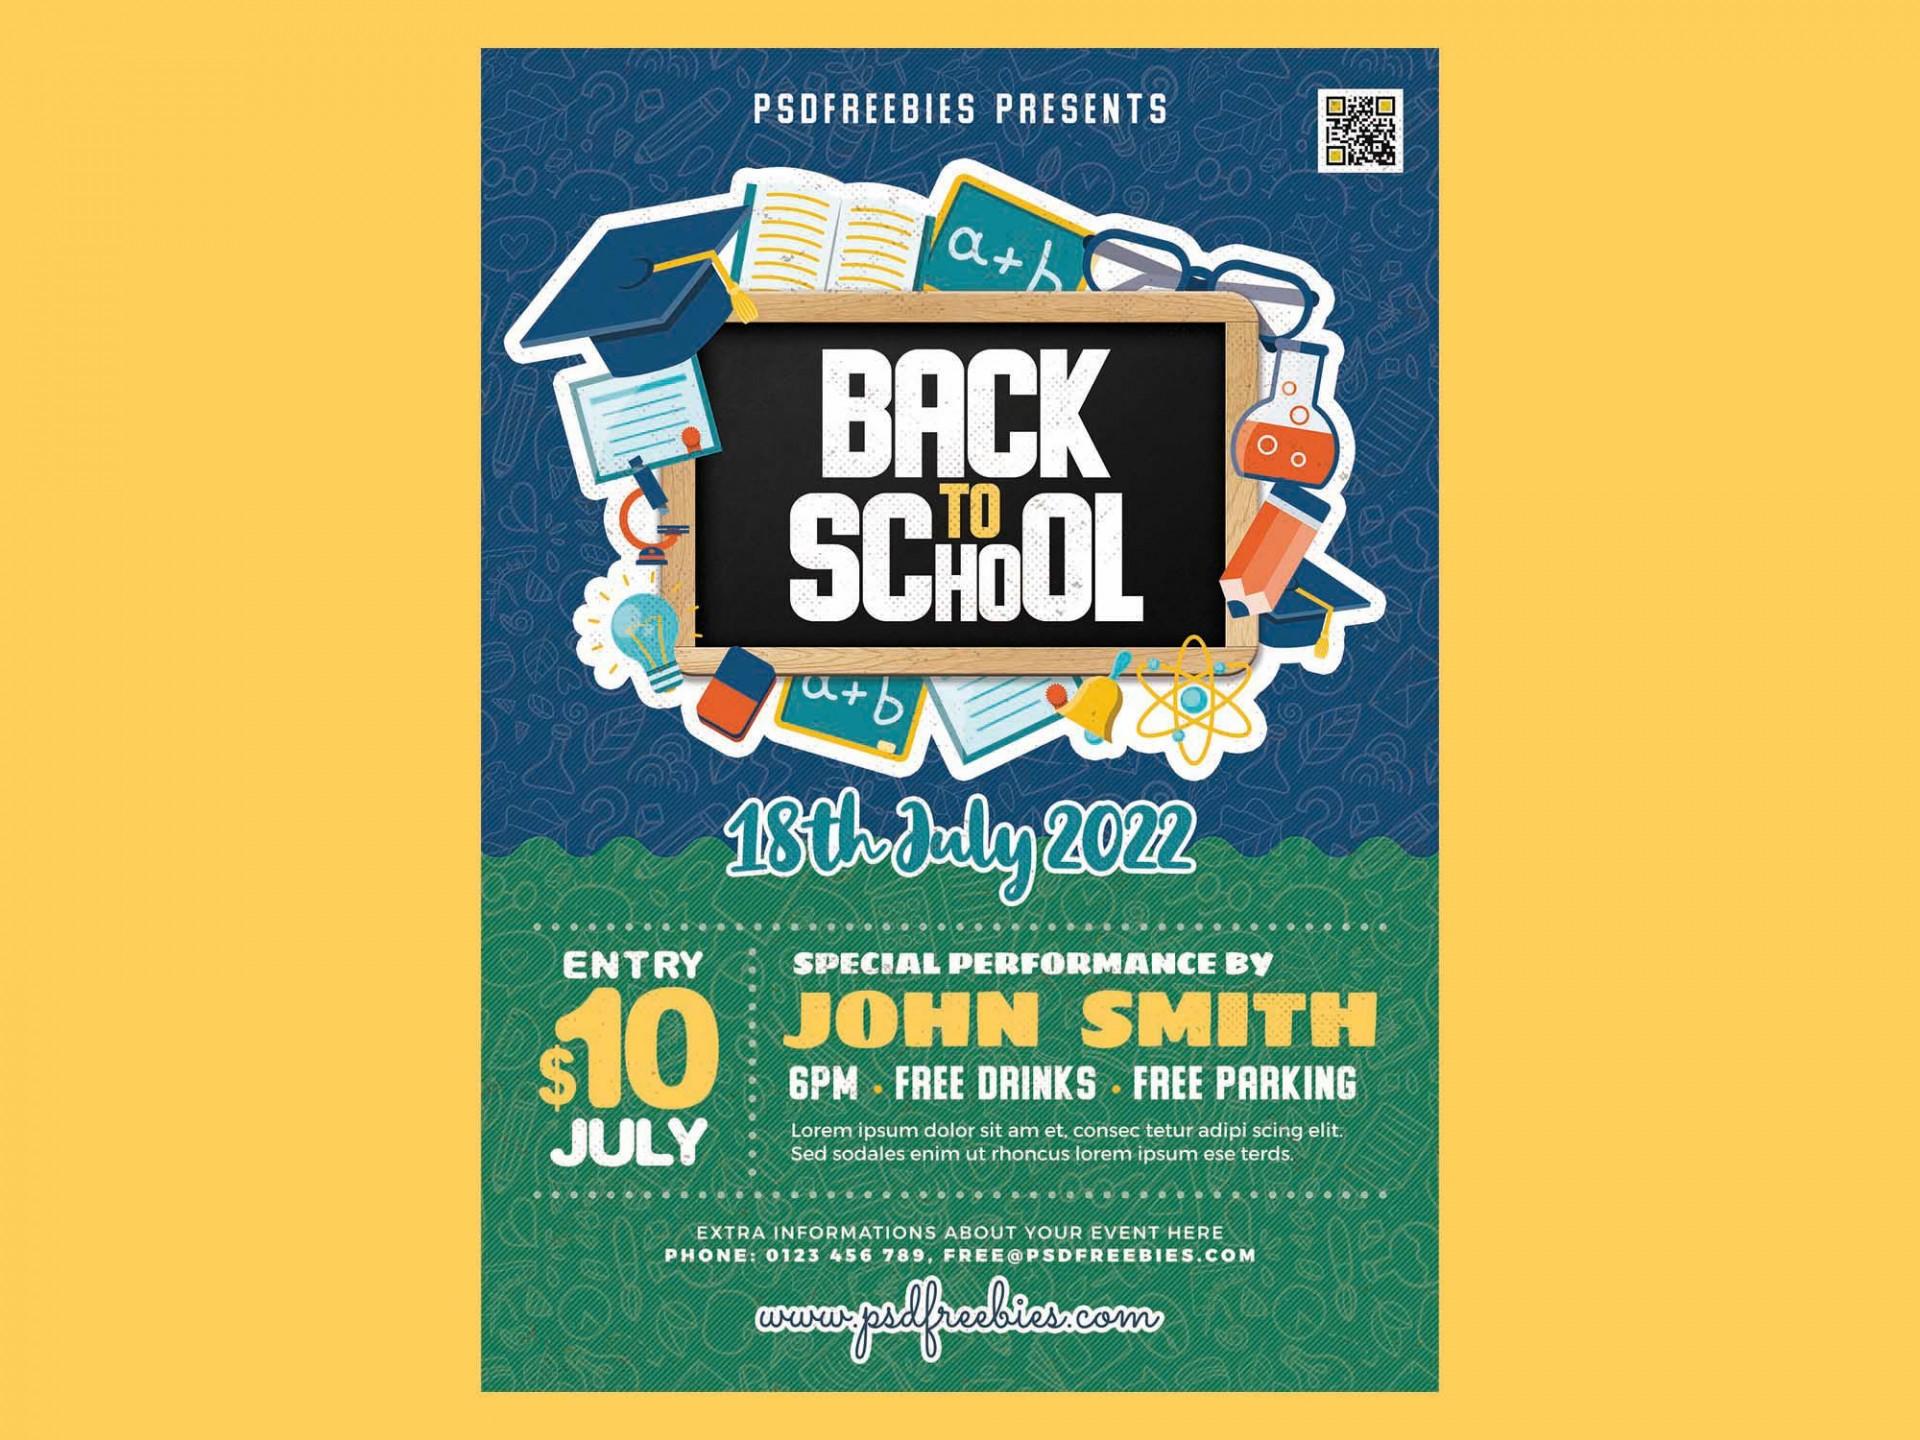 004 Surprising Free School Flyer Design Template Inspiration  Templates Creative Education Poster1920